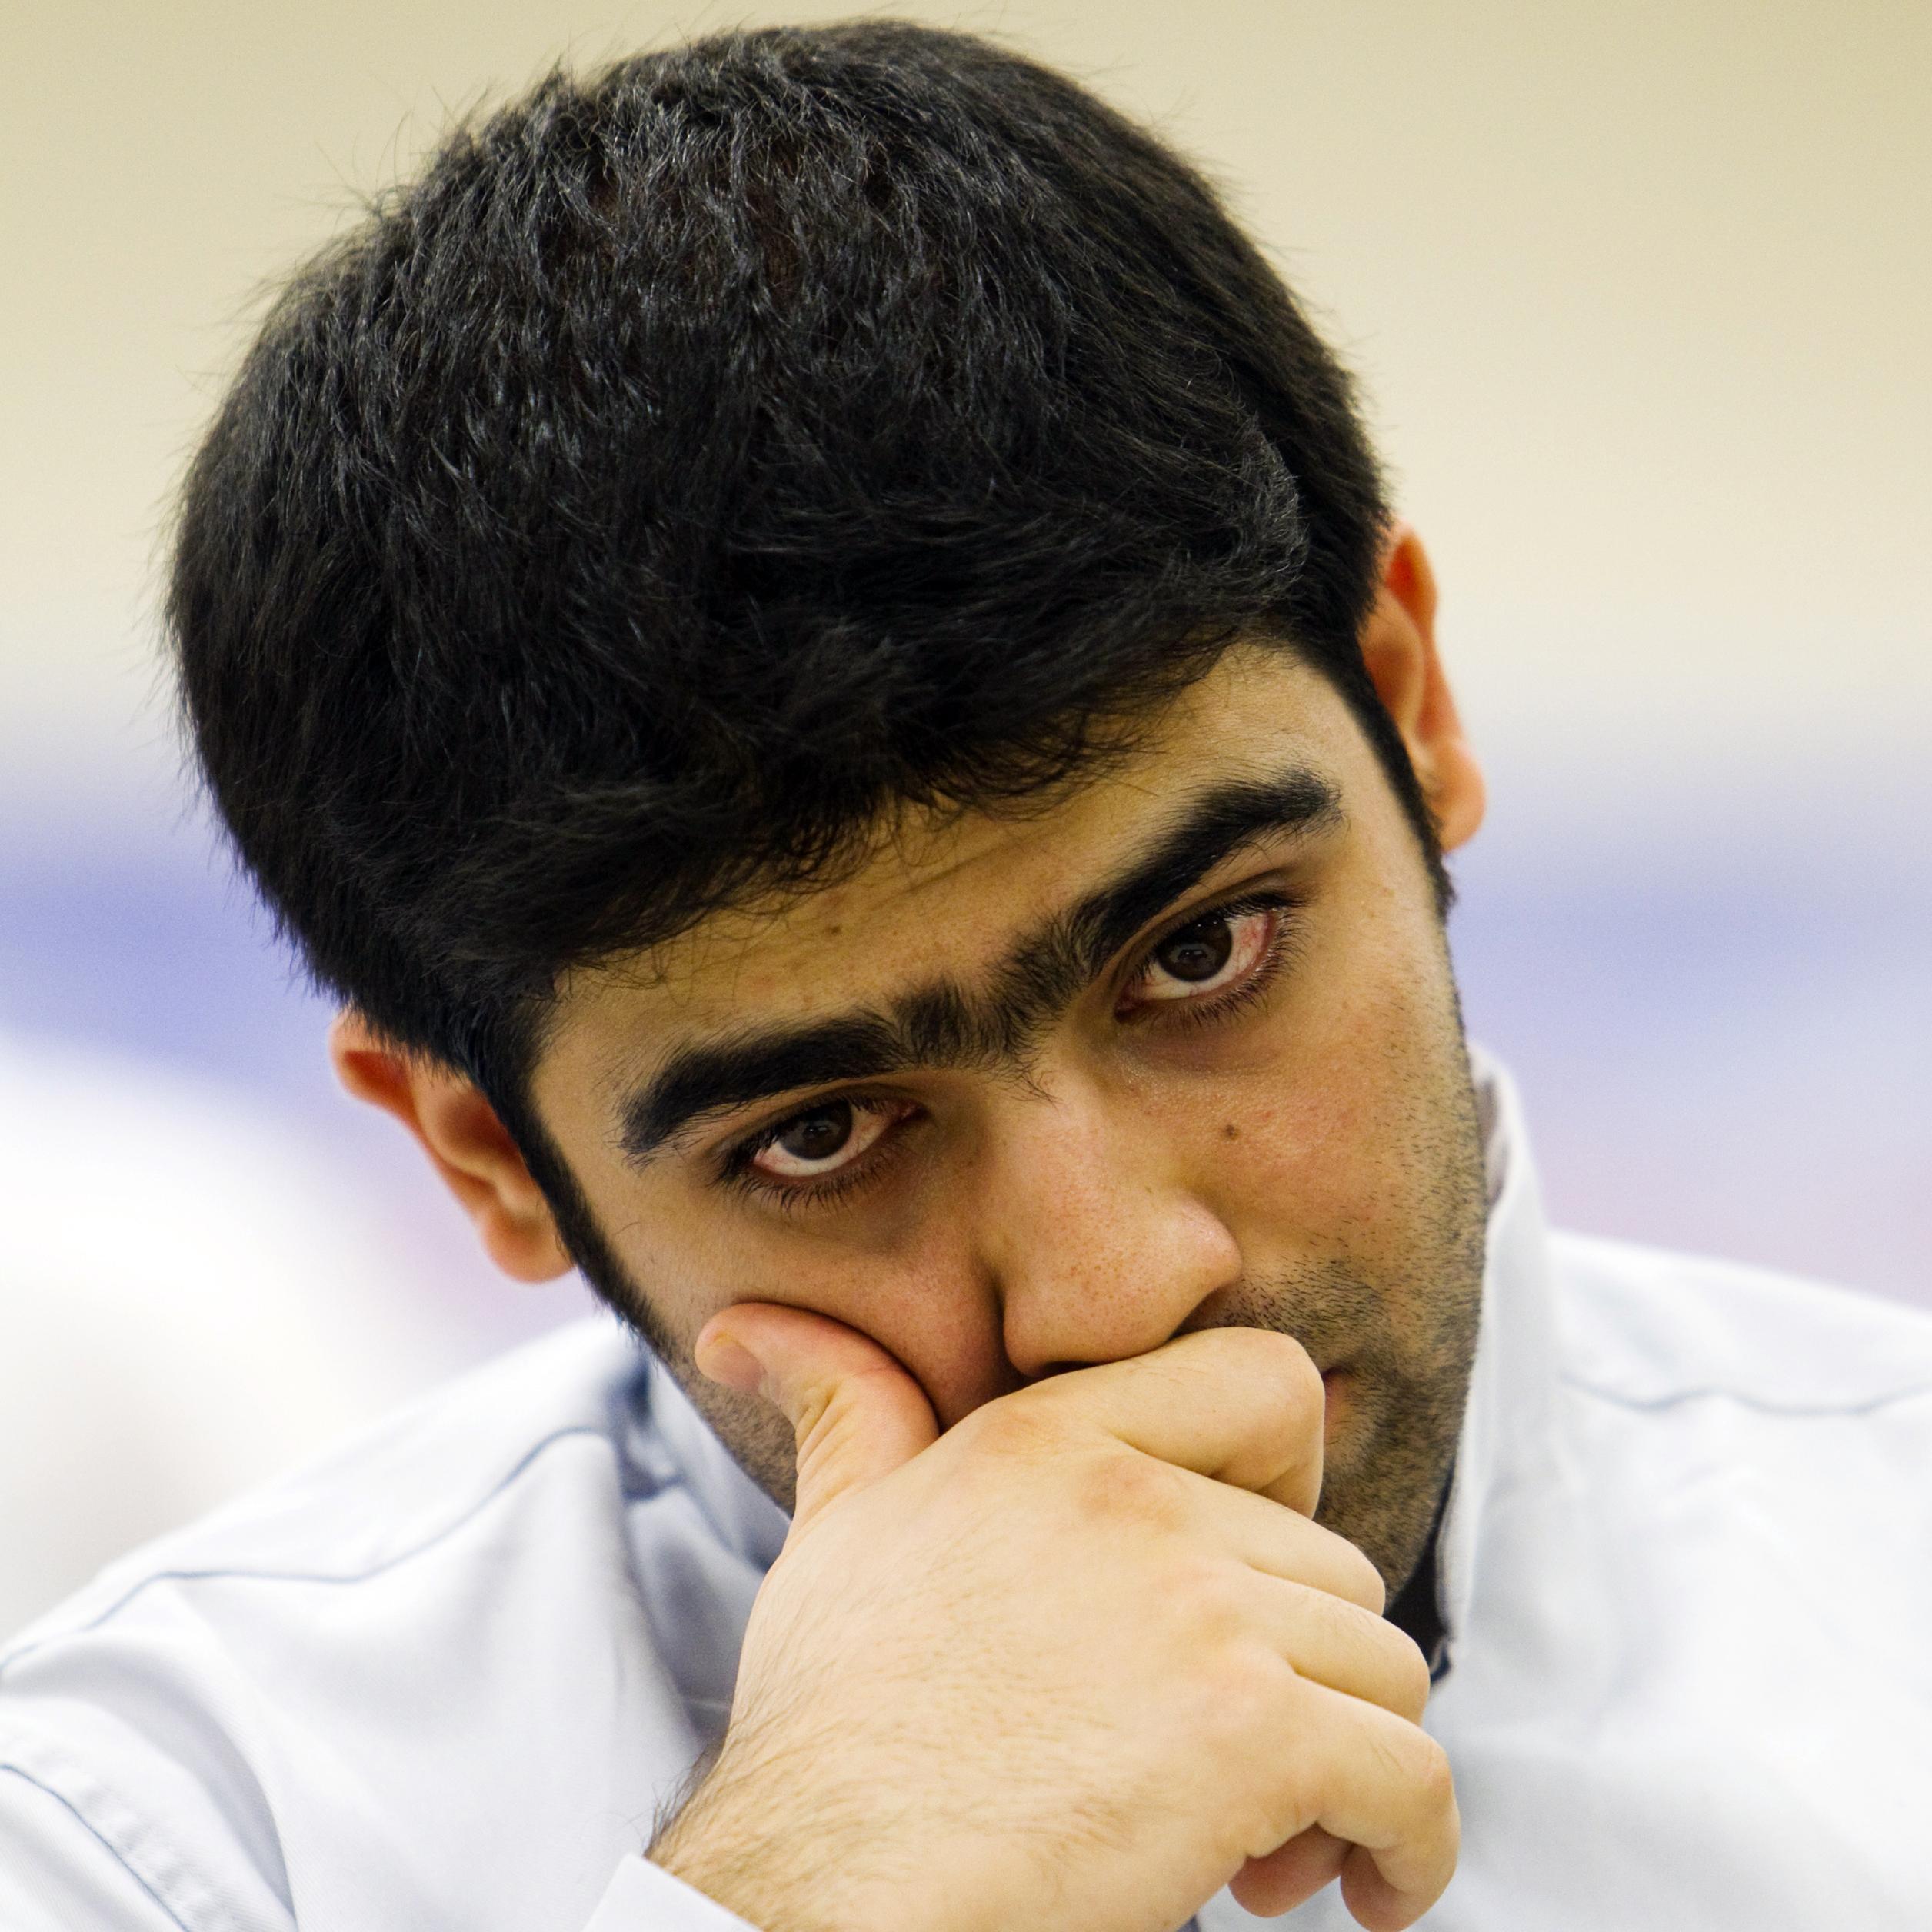 Majid-Jamali-Fashi-IRAN-CROP.jpg